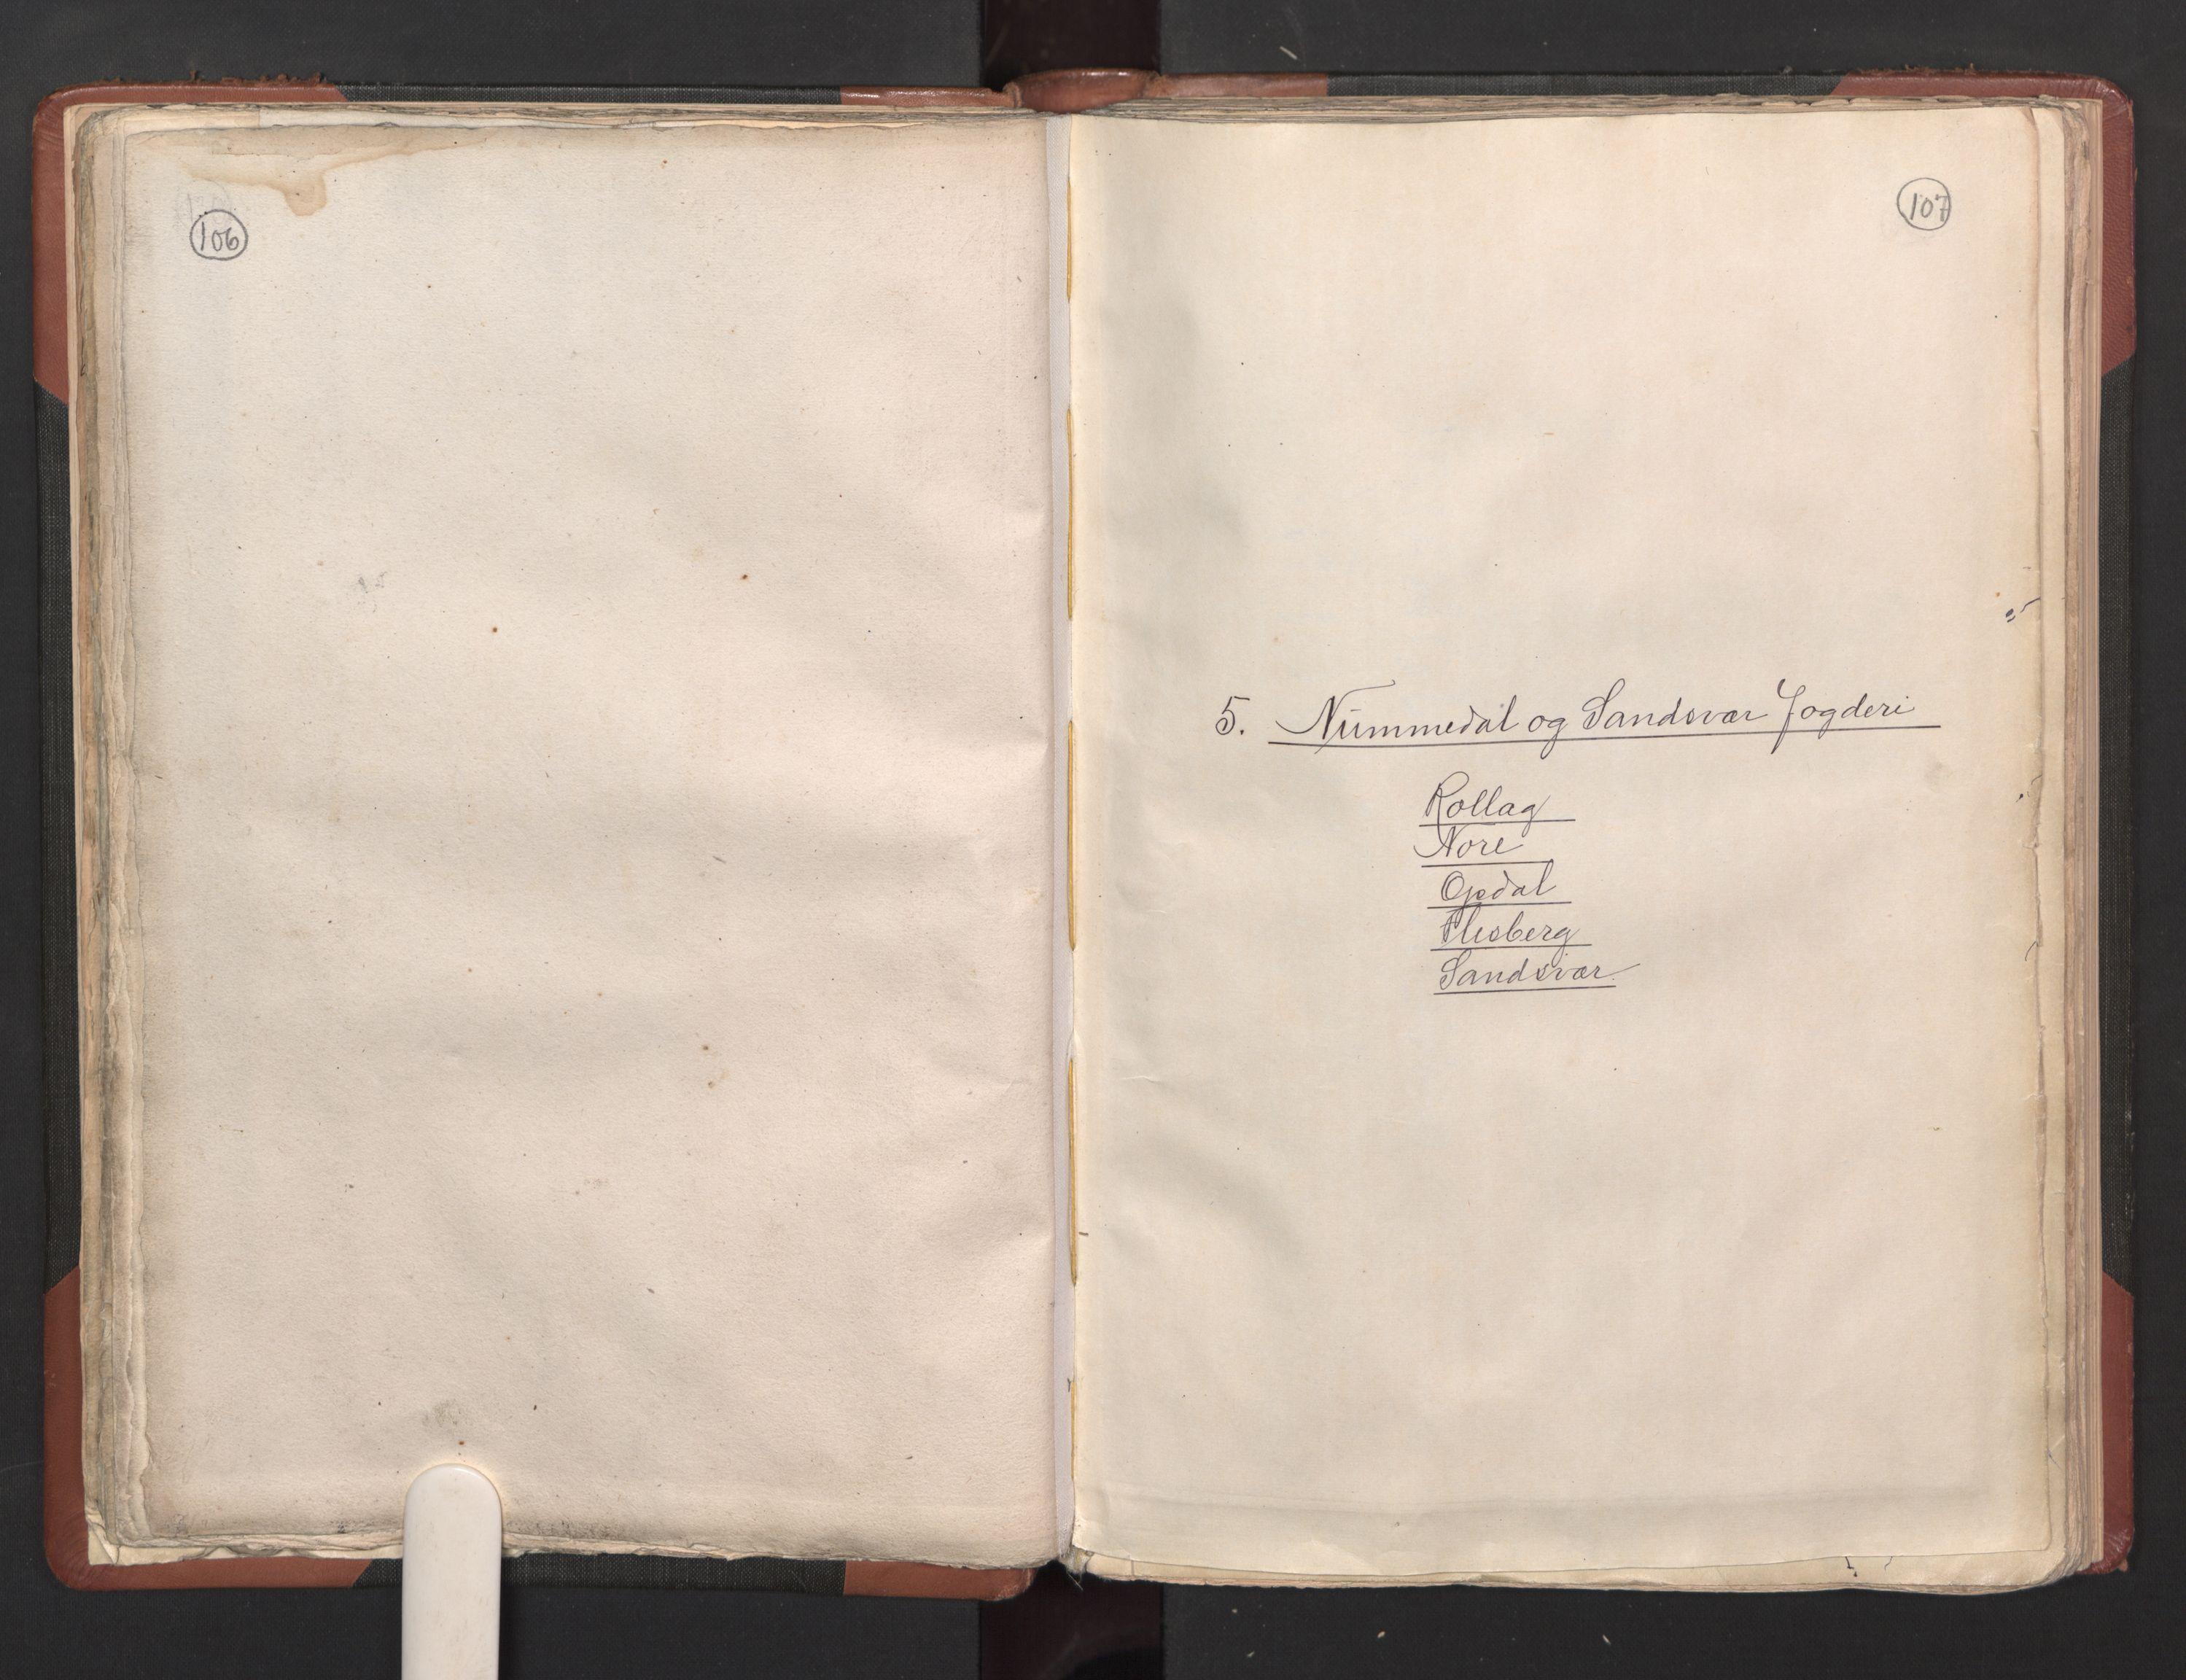 RA, Fogdenes og sorenskrivernes manntall 1664-1666, nr. 5: Fogderier (len og skipreider) i nåværende Buskerud fylke og Vestfold fylke, 1664, s. 106-107